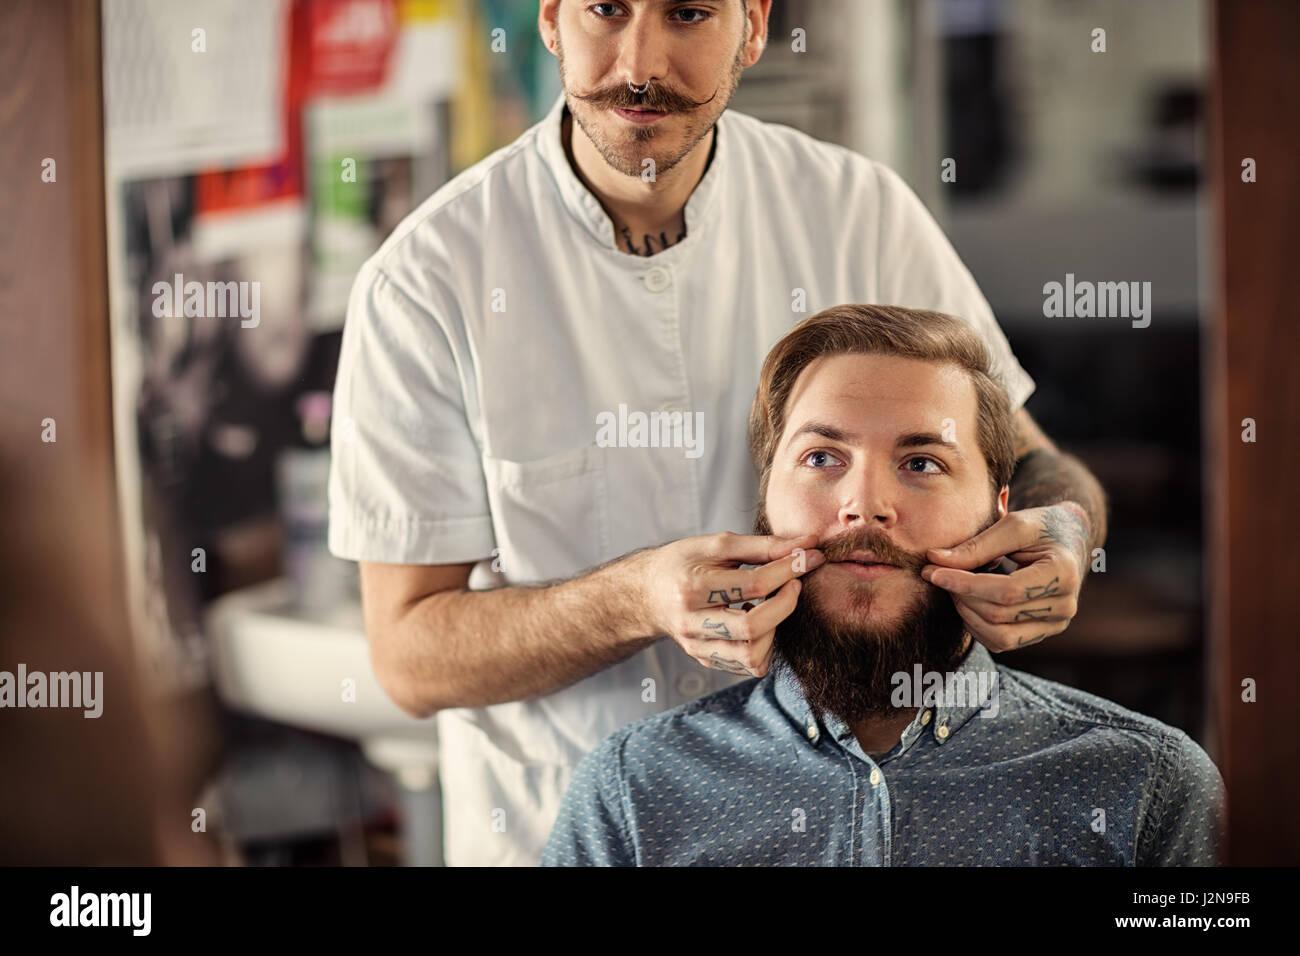 male hairdresser shave stock photos male hairdresser shave stock images alamy. Black Bedroom Furniture Sets. Home Design Ideas